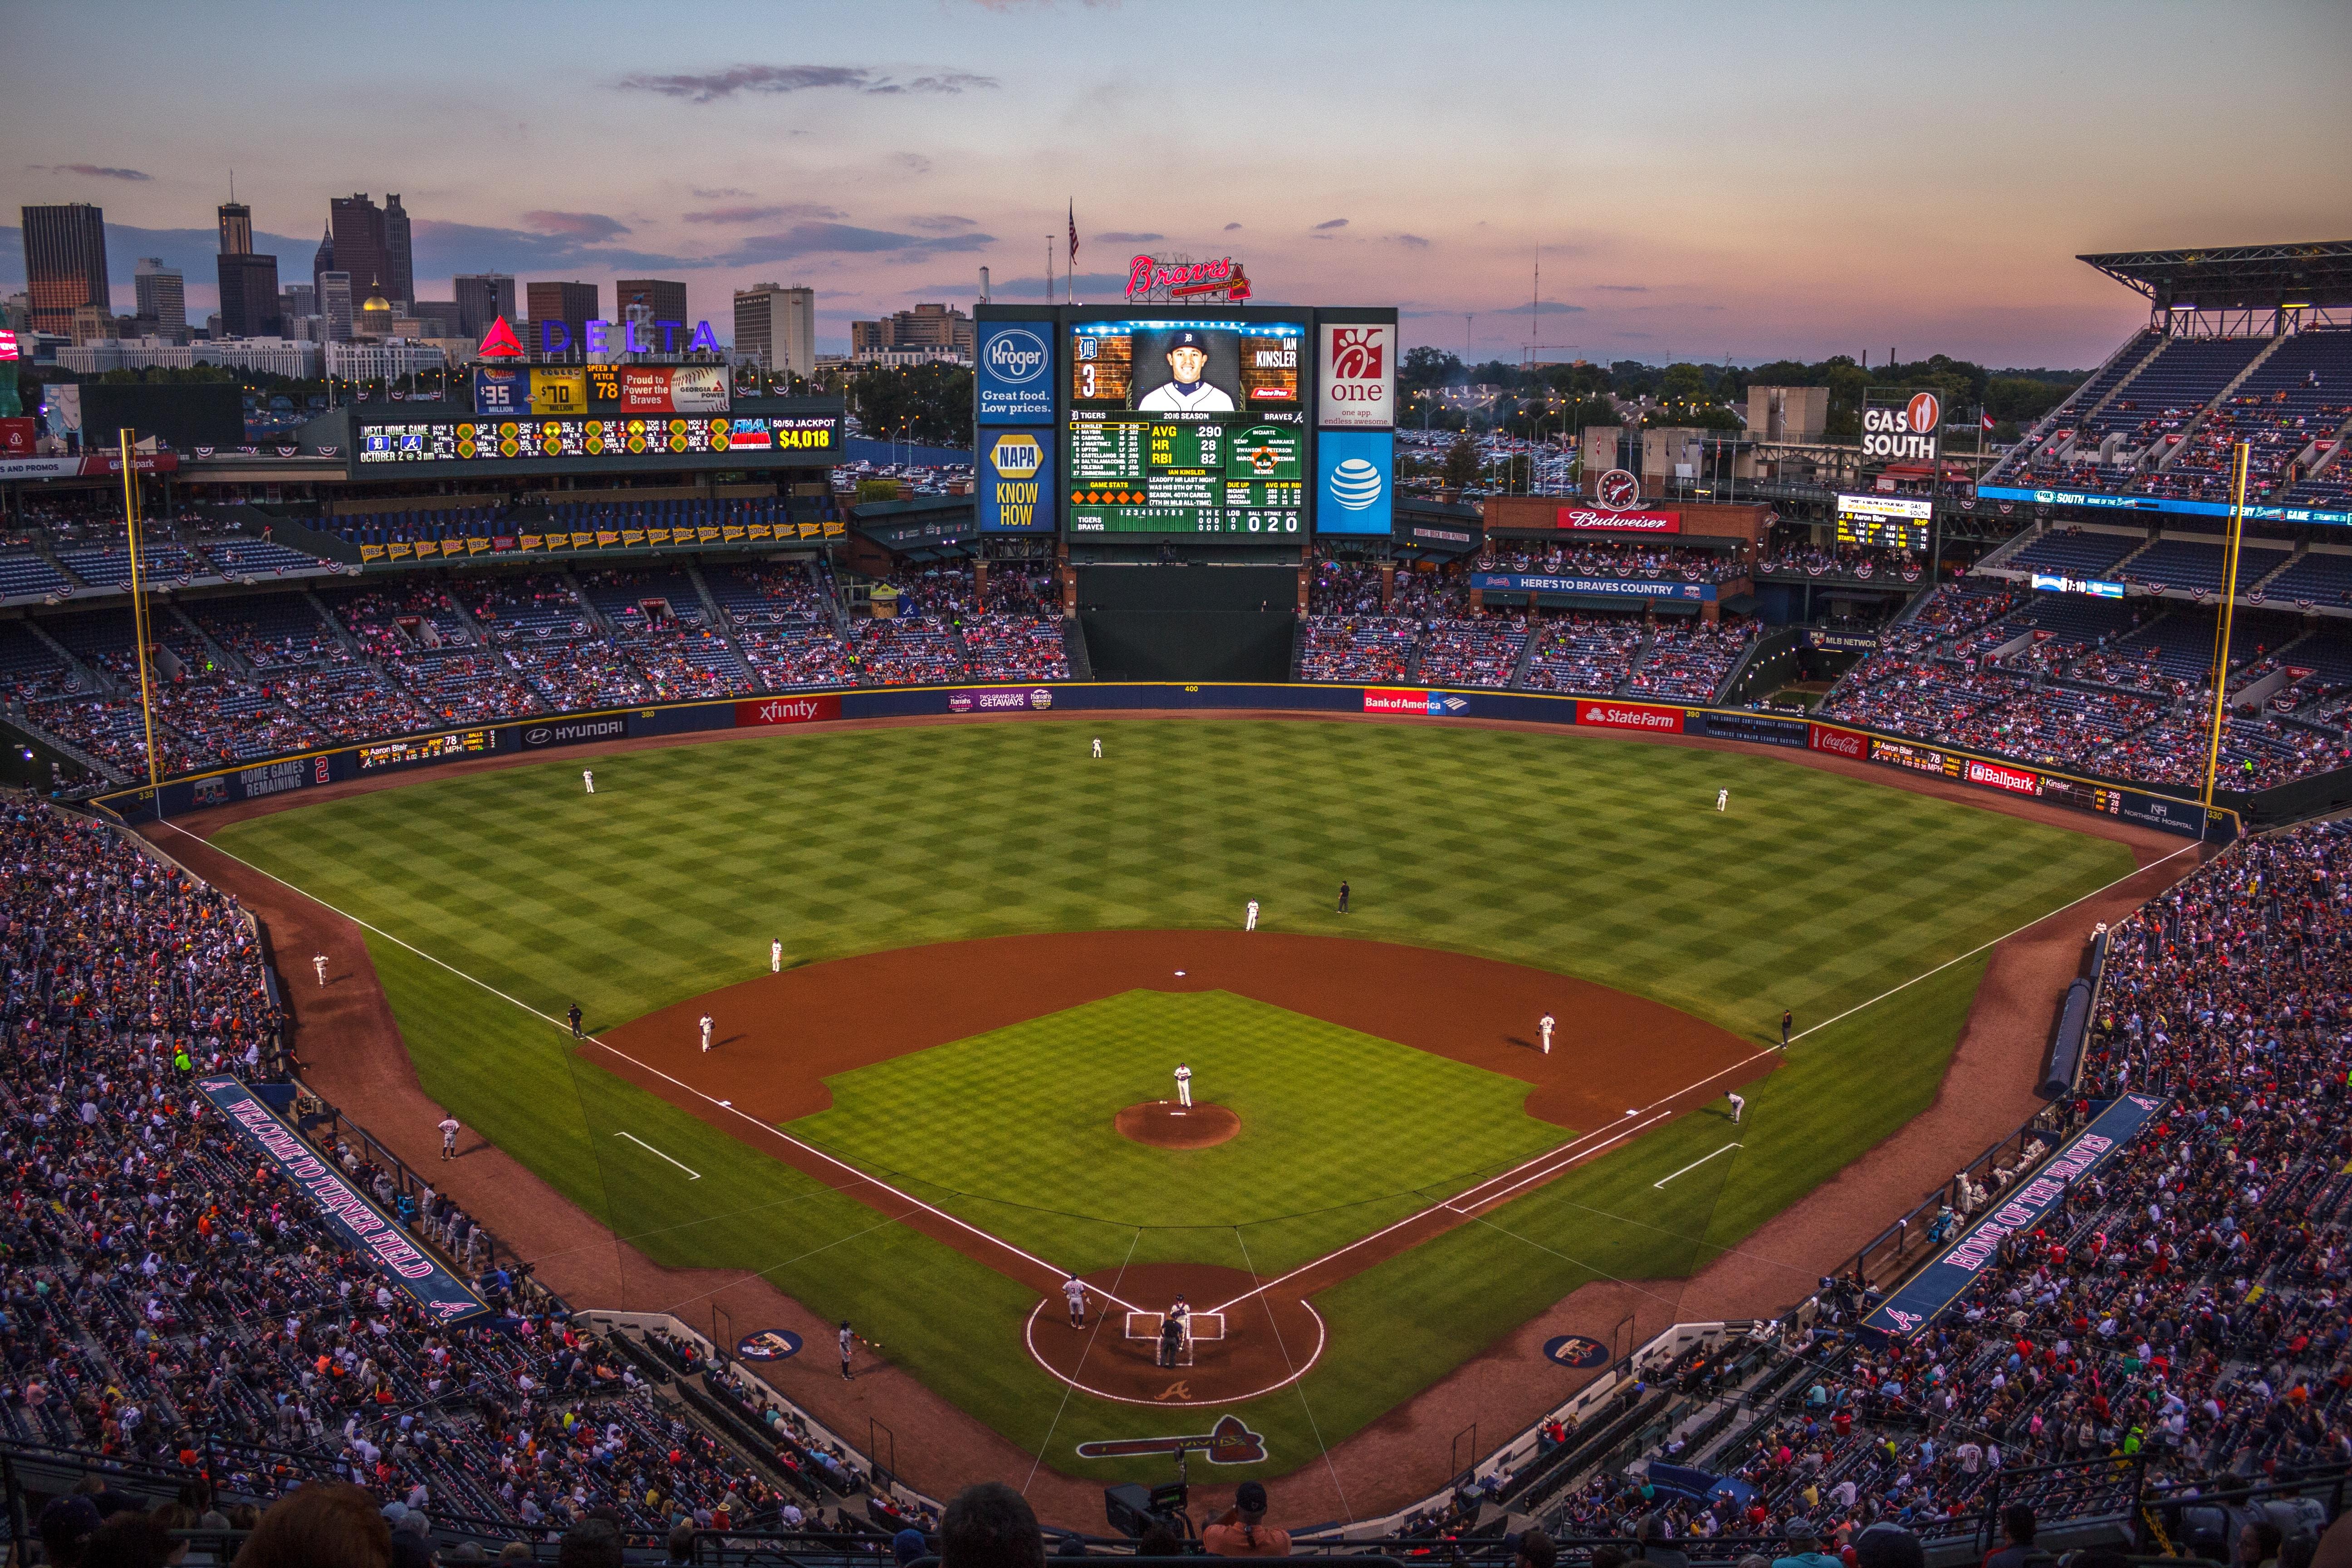 A major leagues baseball game at Turner Field